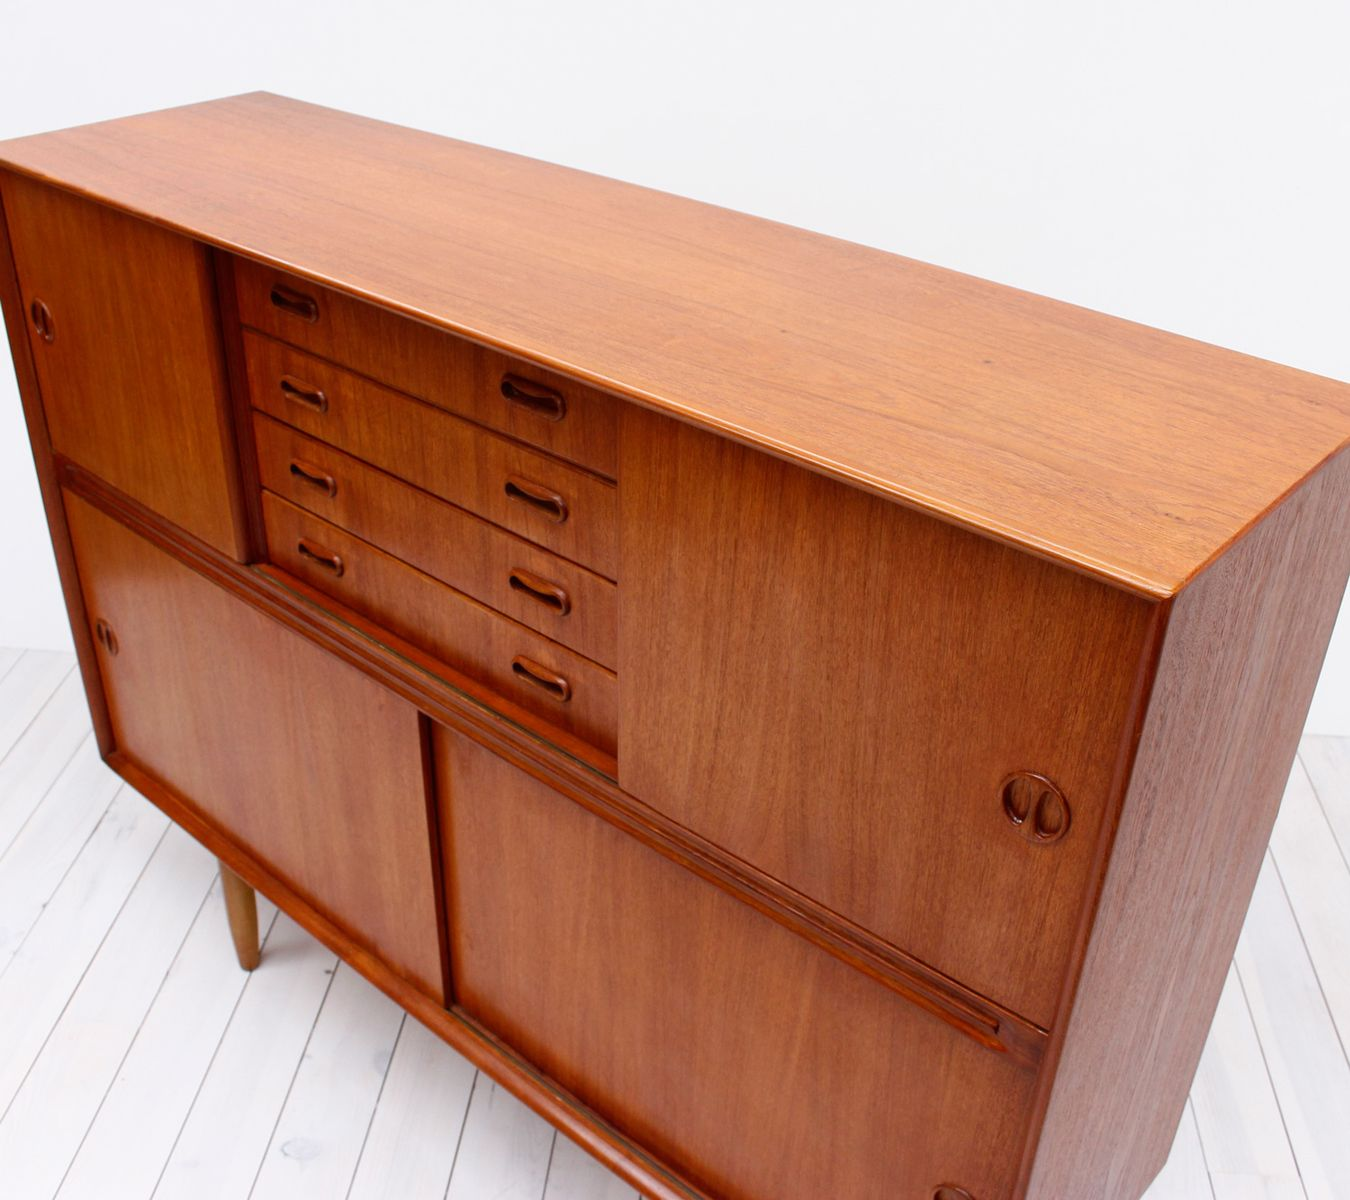 haut buffet en teck danemark 1960s en vente sur pamono. Black Bedroom Furniture Sets. Home Design Ideas